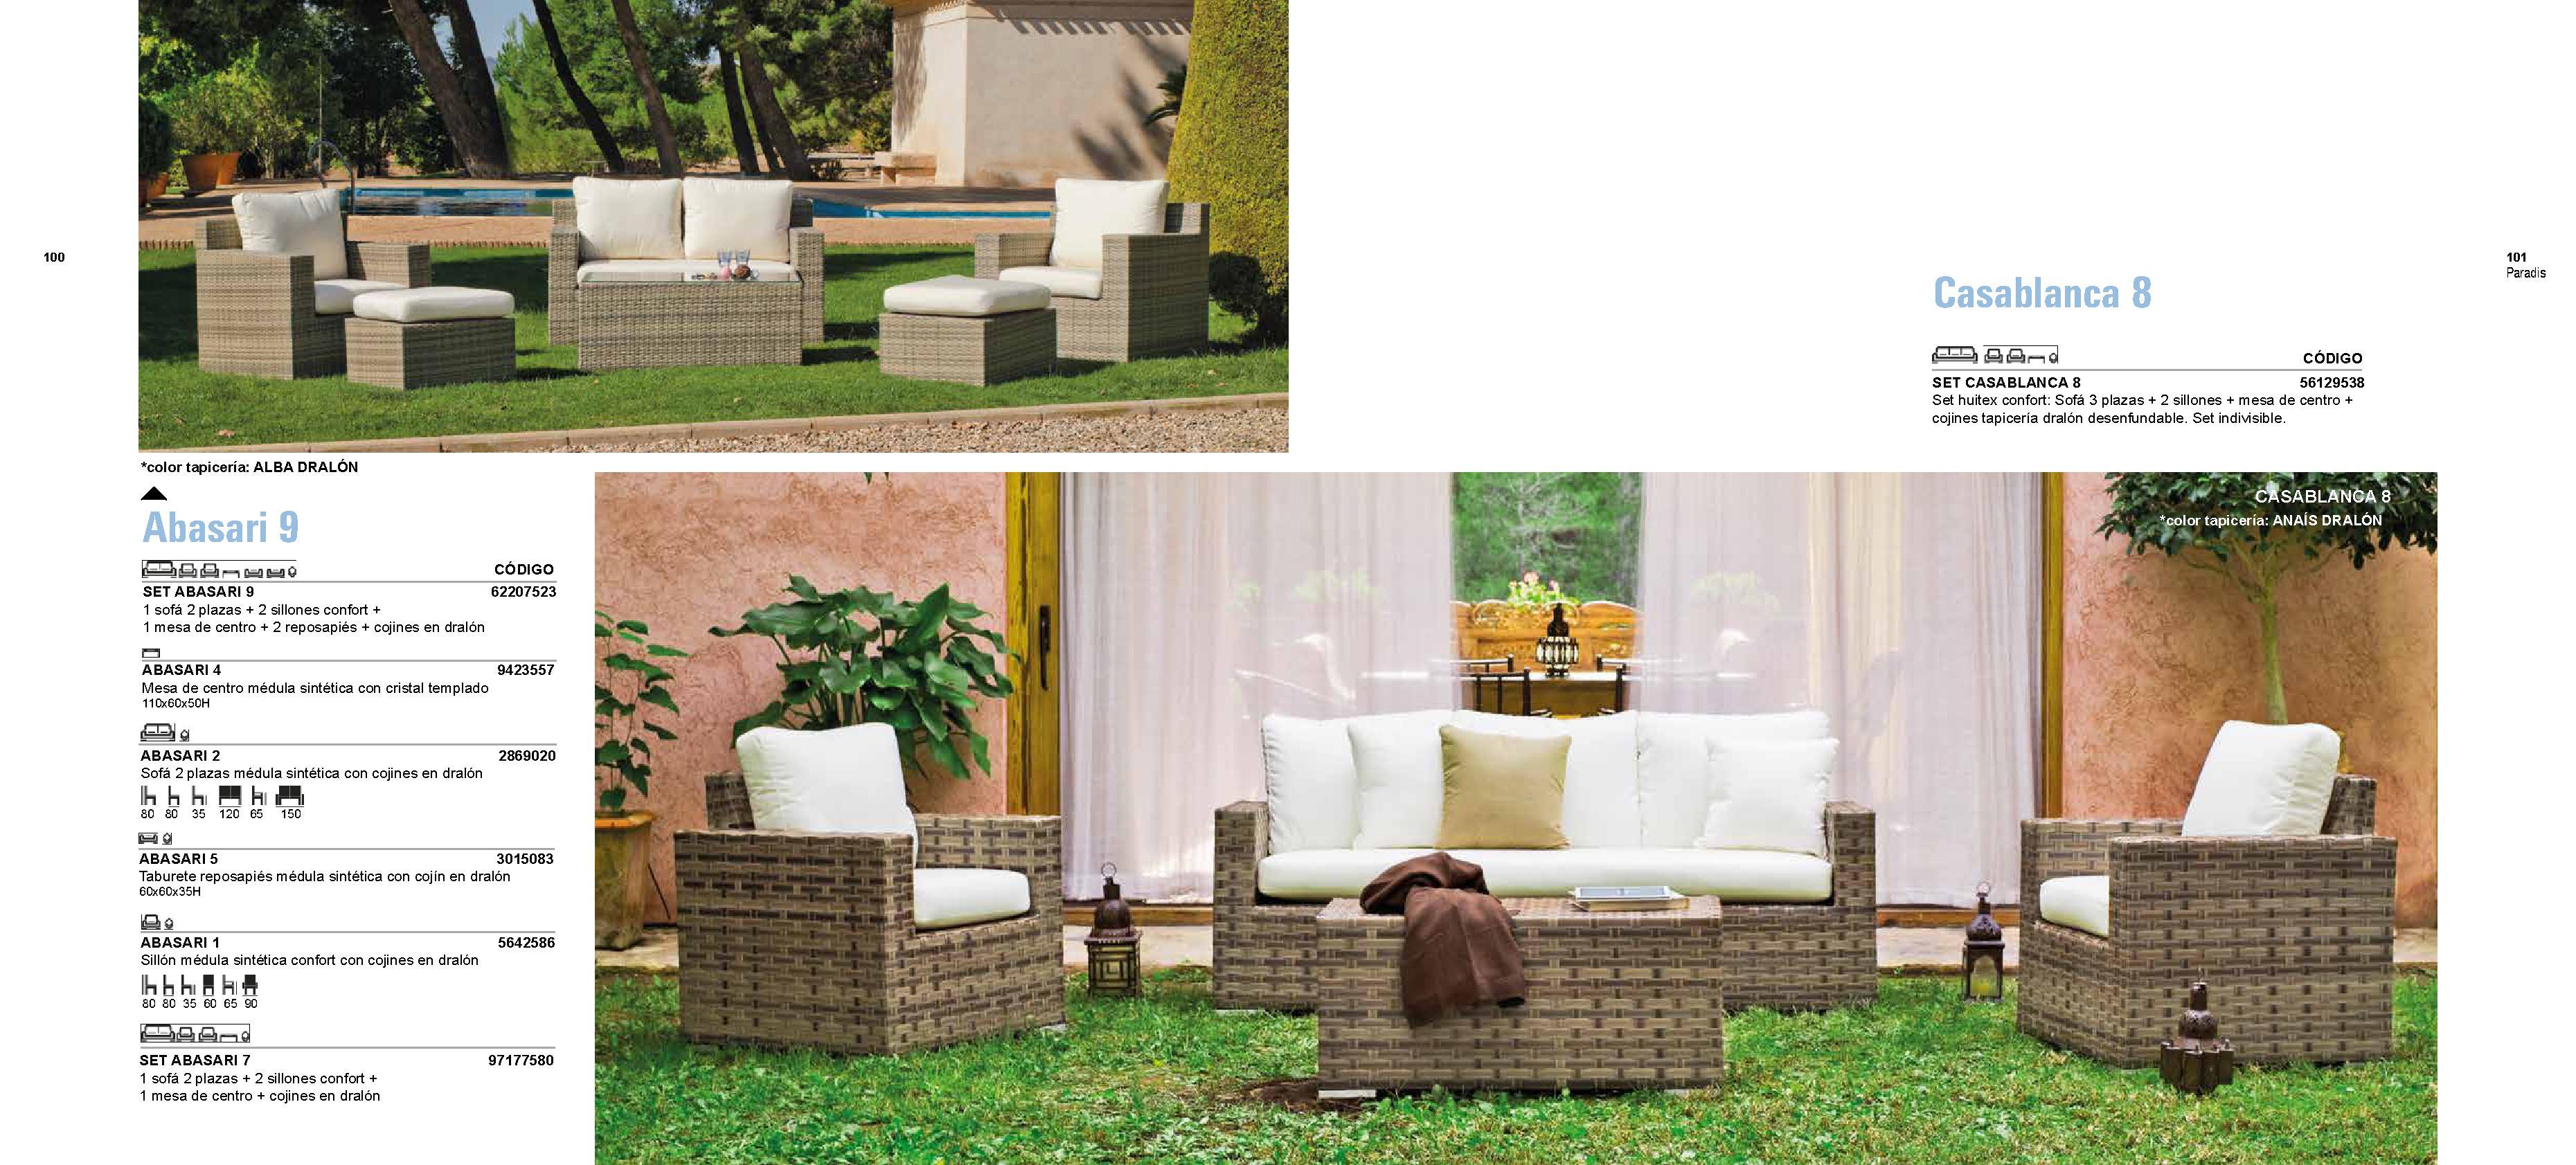 Muebles De Hosteleria En Almu Ecar # Muebles Hosteleria